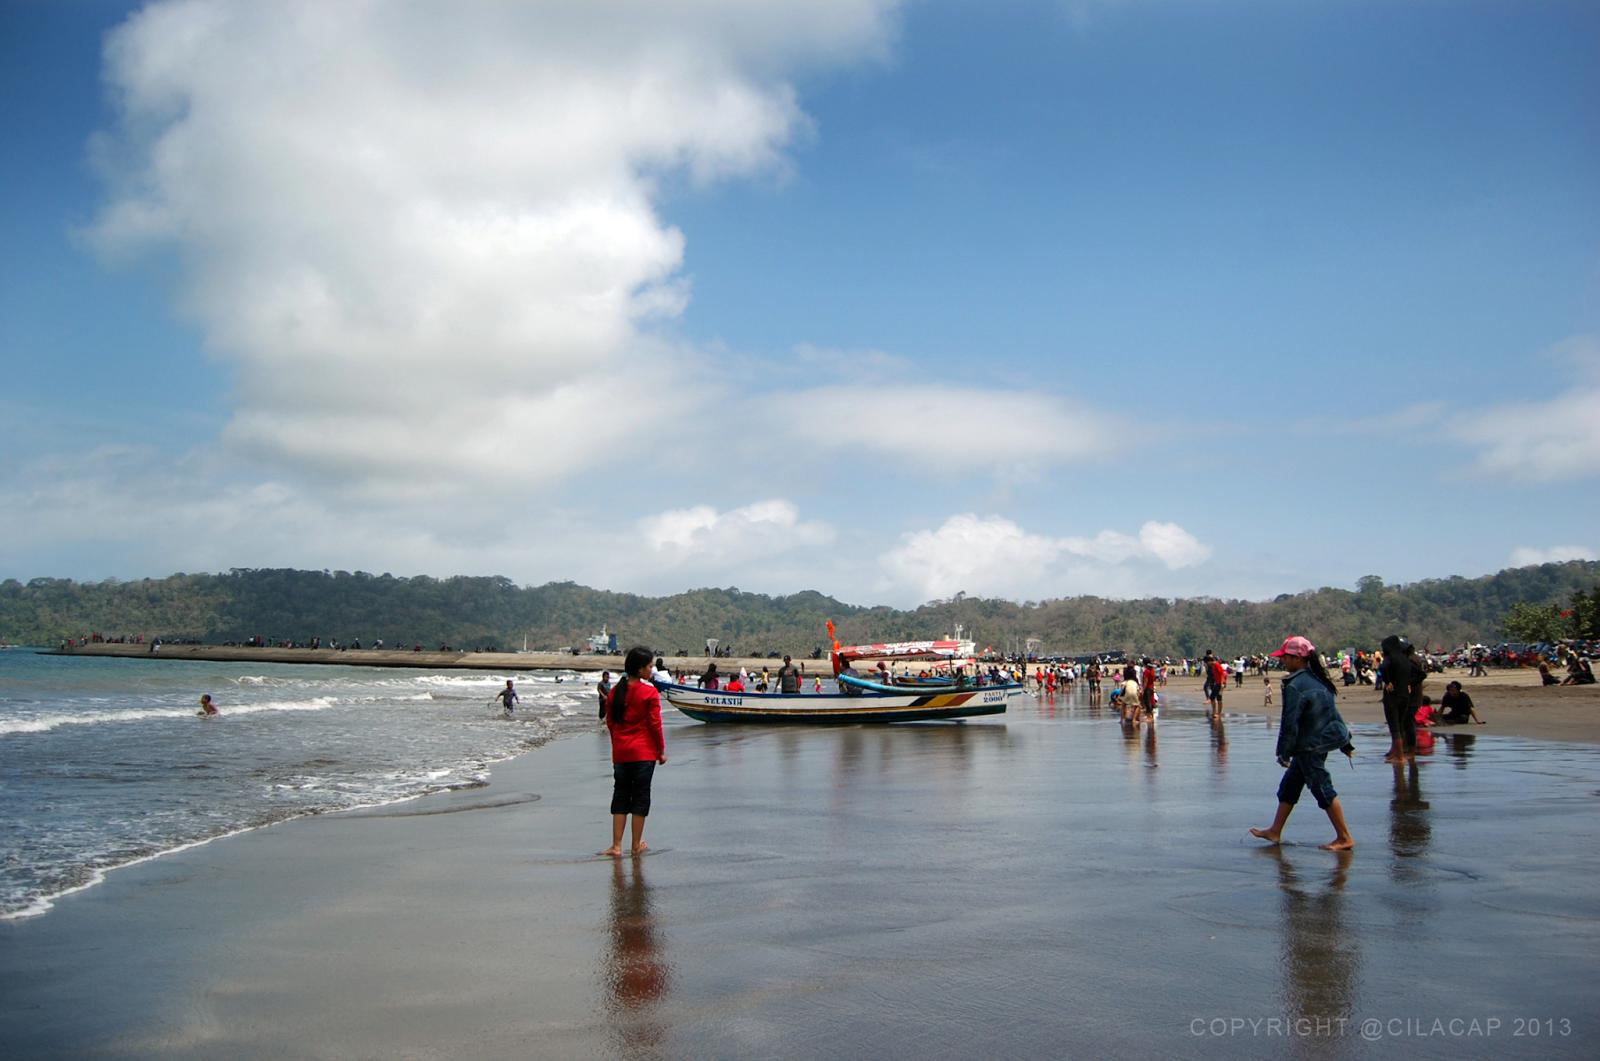 Pantai Teluk Penyu Ayo Wisata Cilacap Kawasan Membujur Utara Pelabuhan